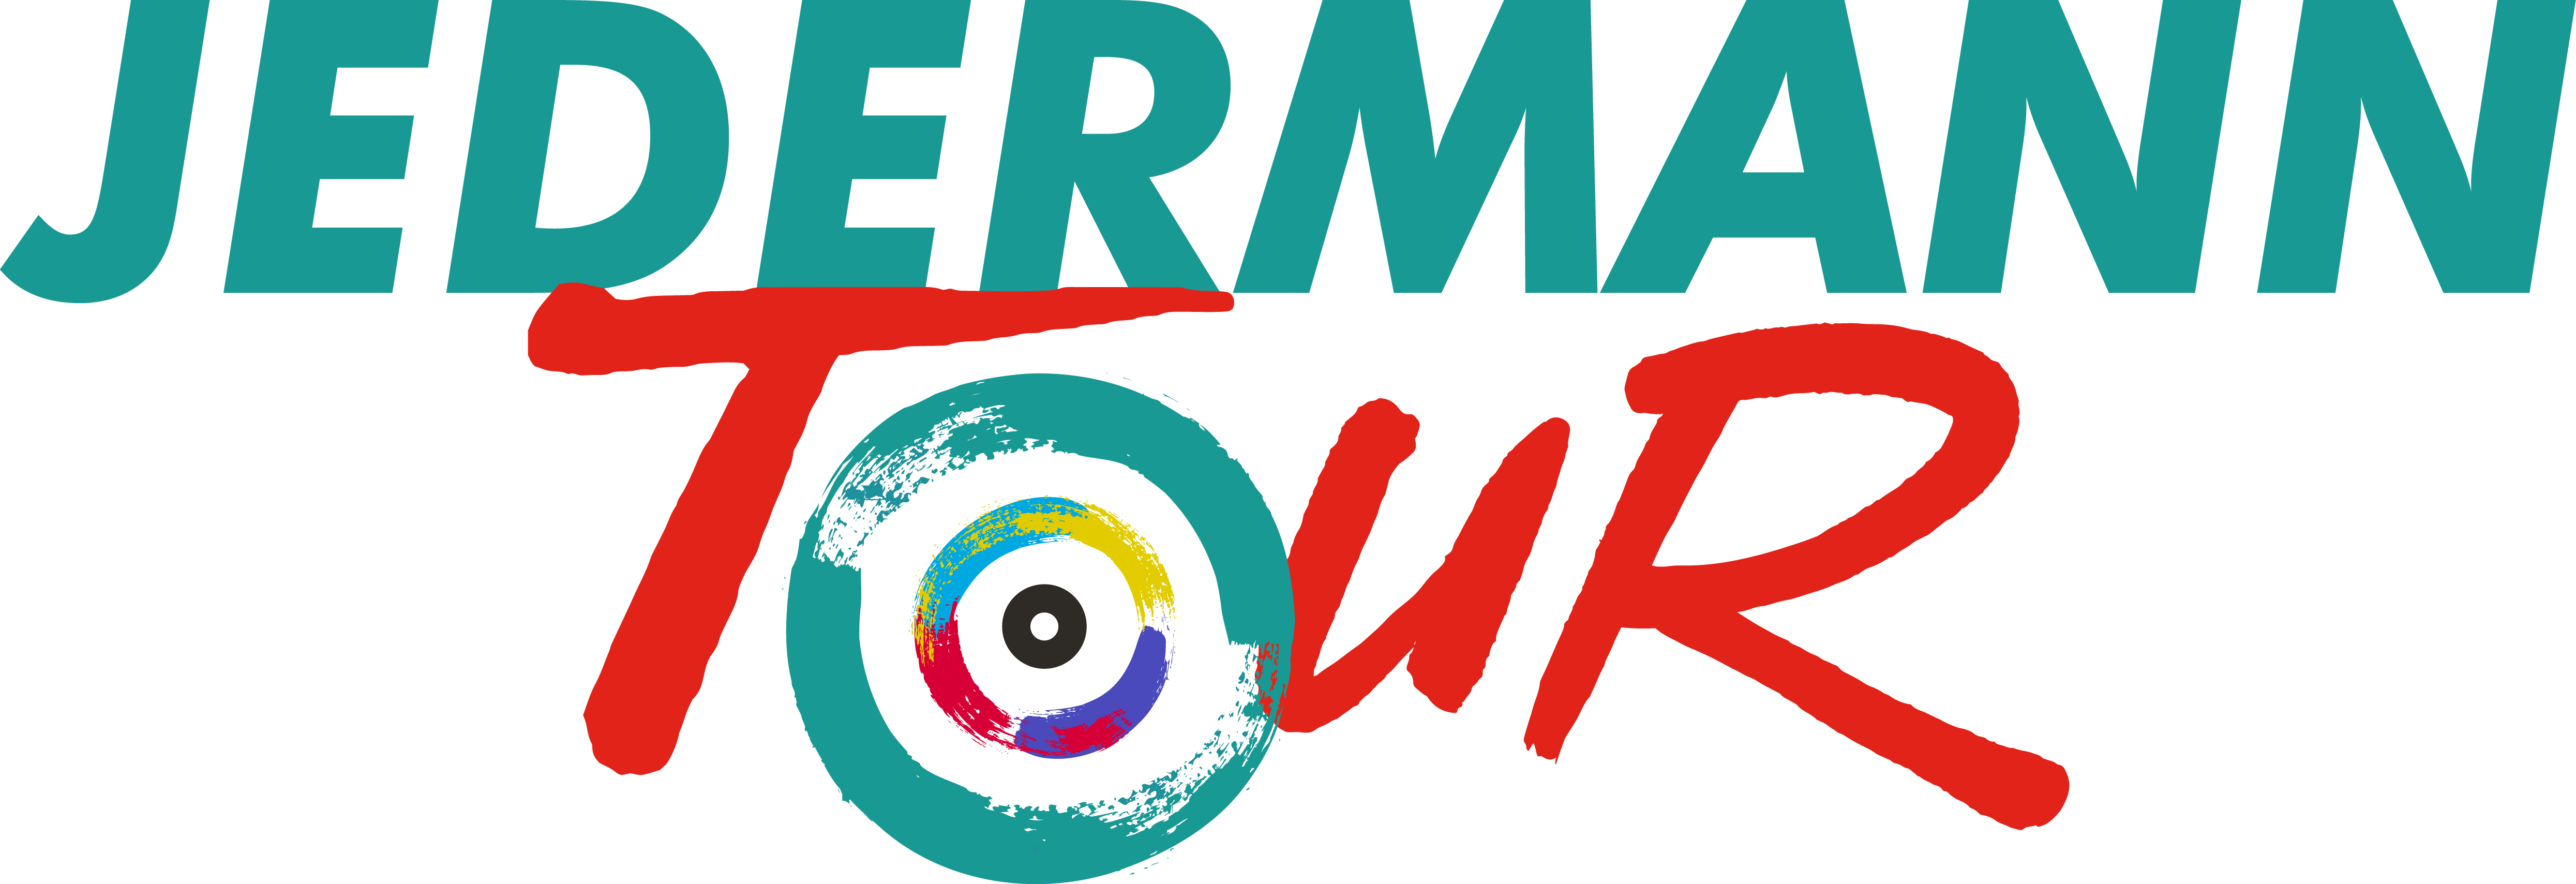 Logo Jedermann Tour